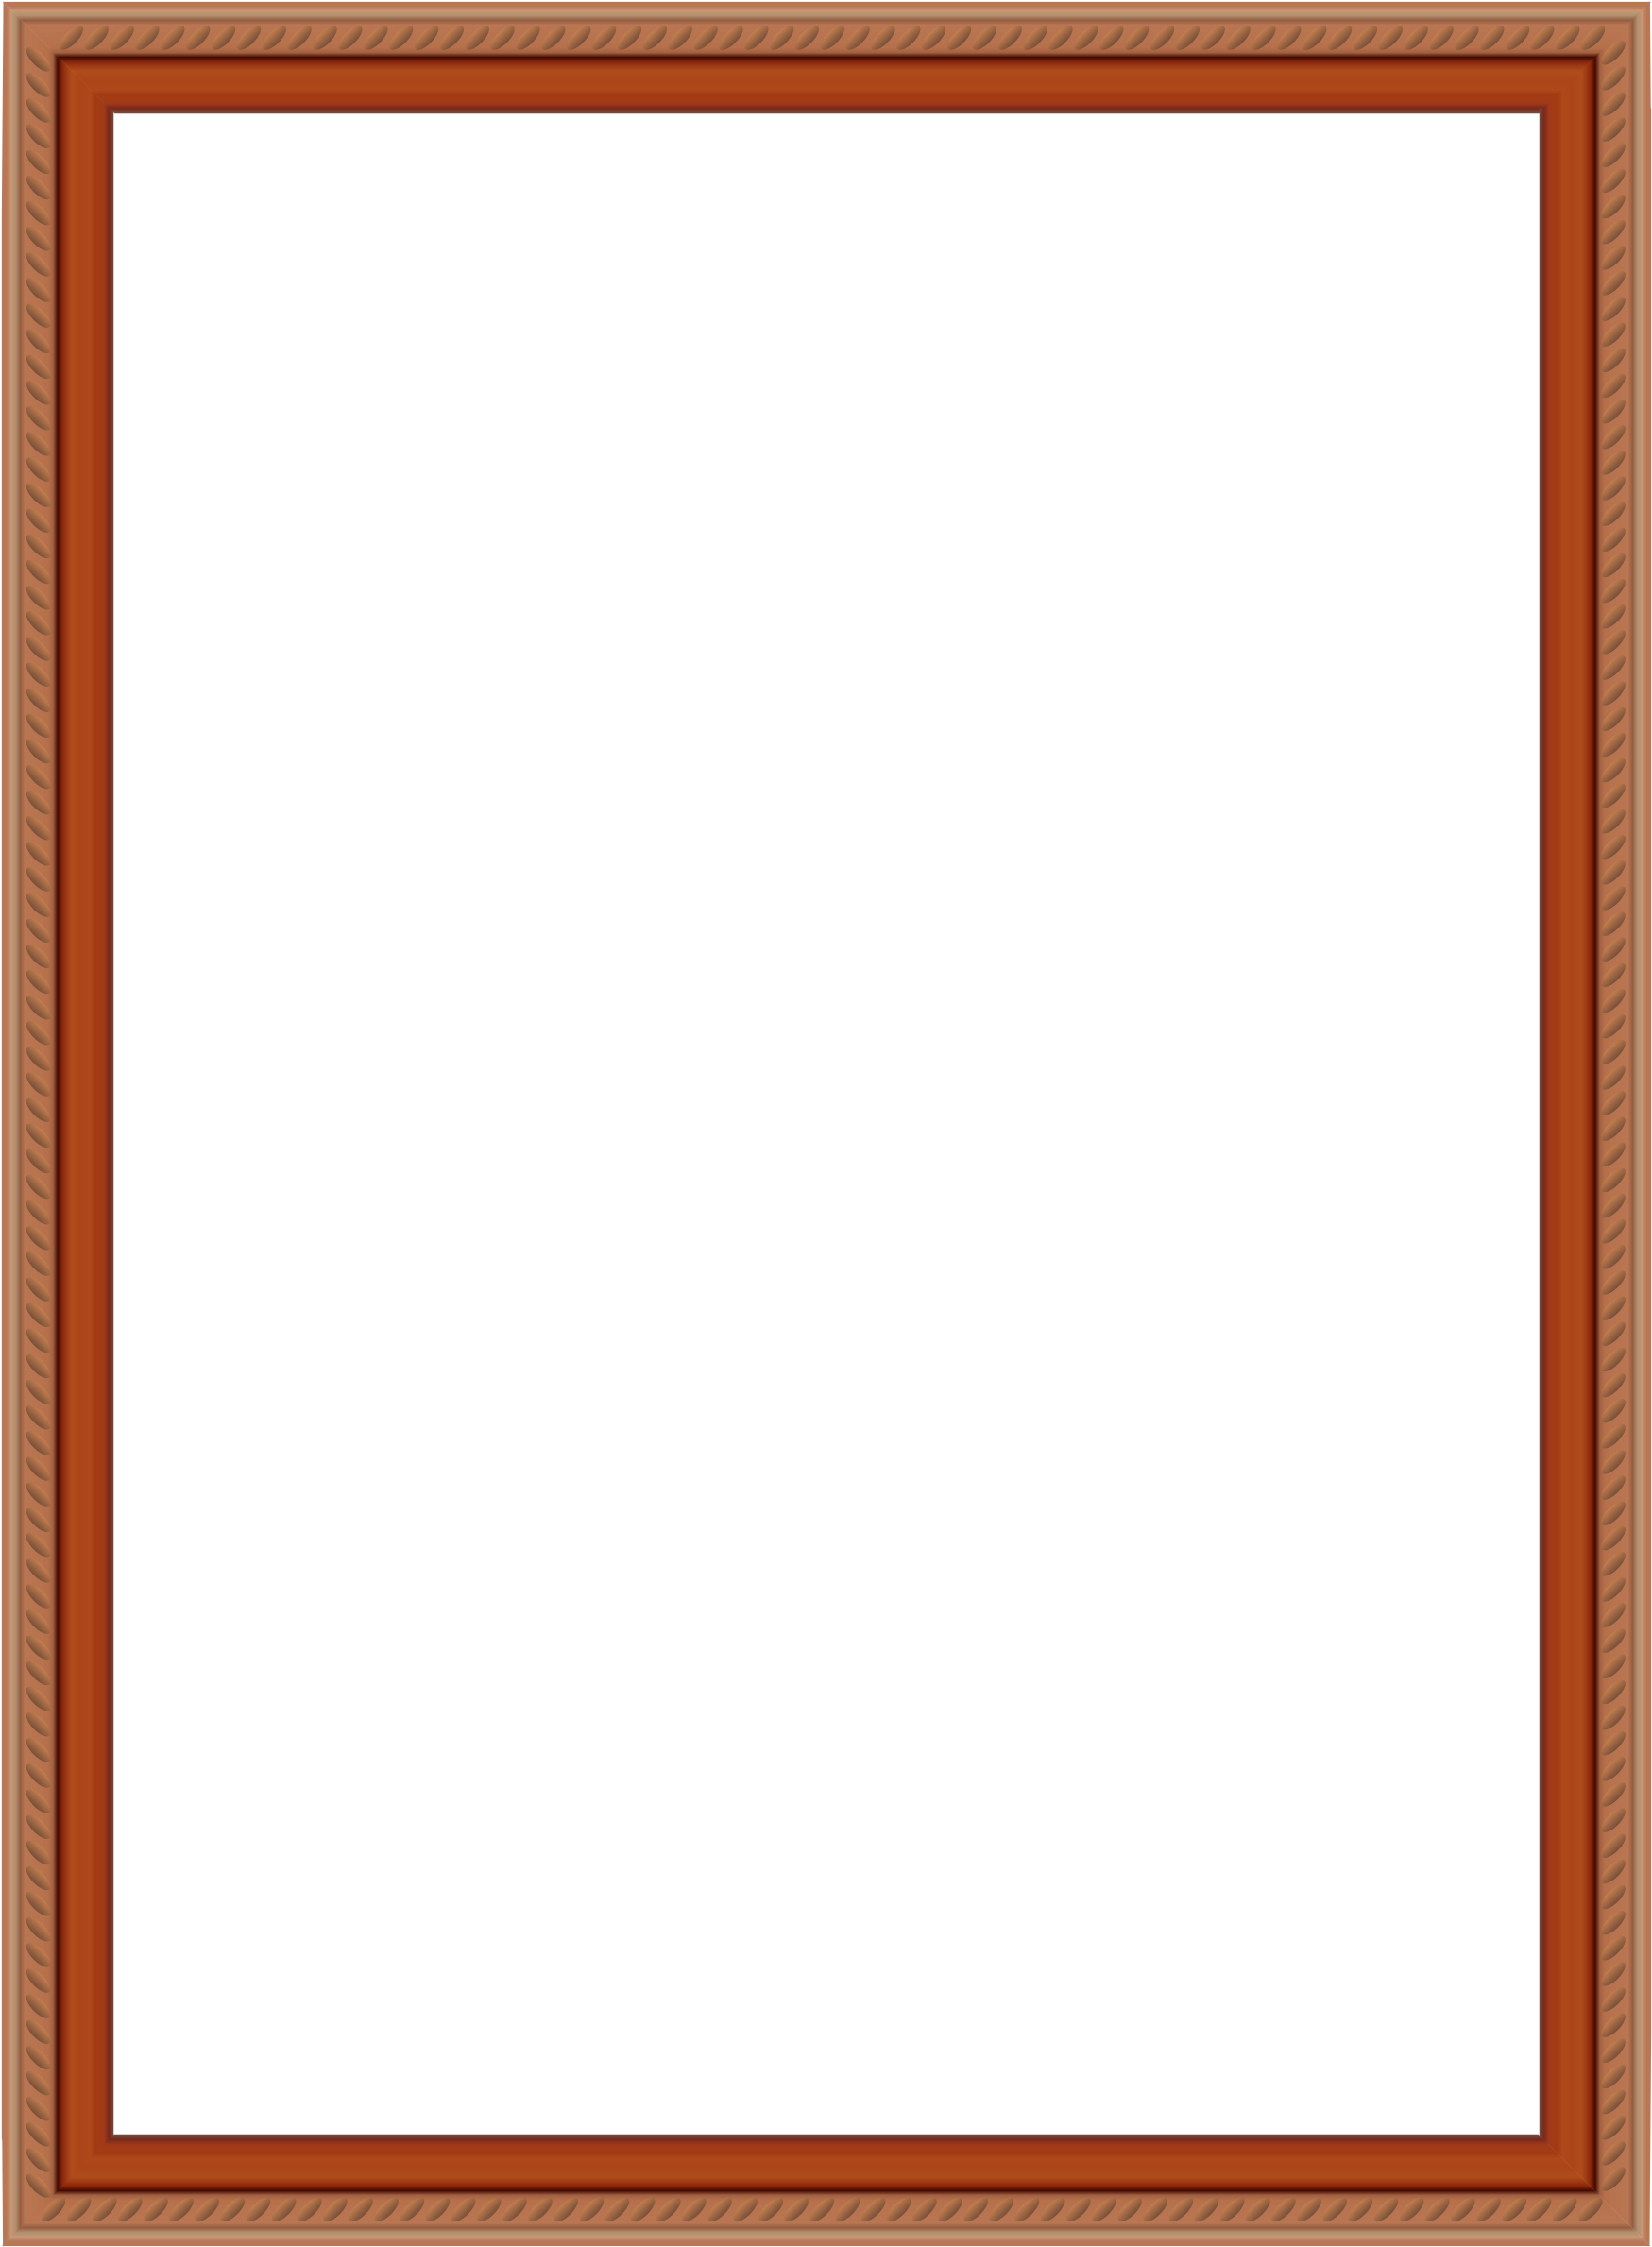 Border Free Metallic Shadow Box Free Picture Frame.